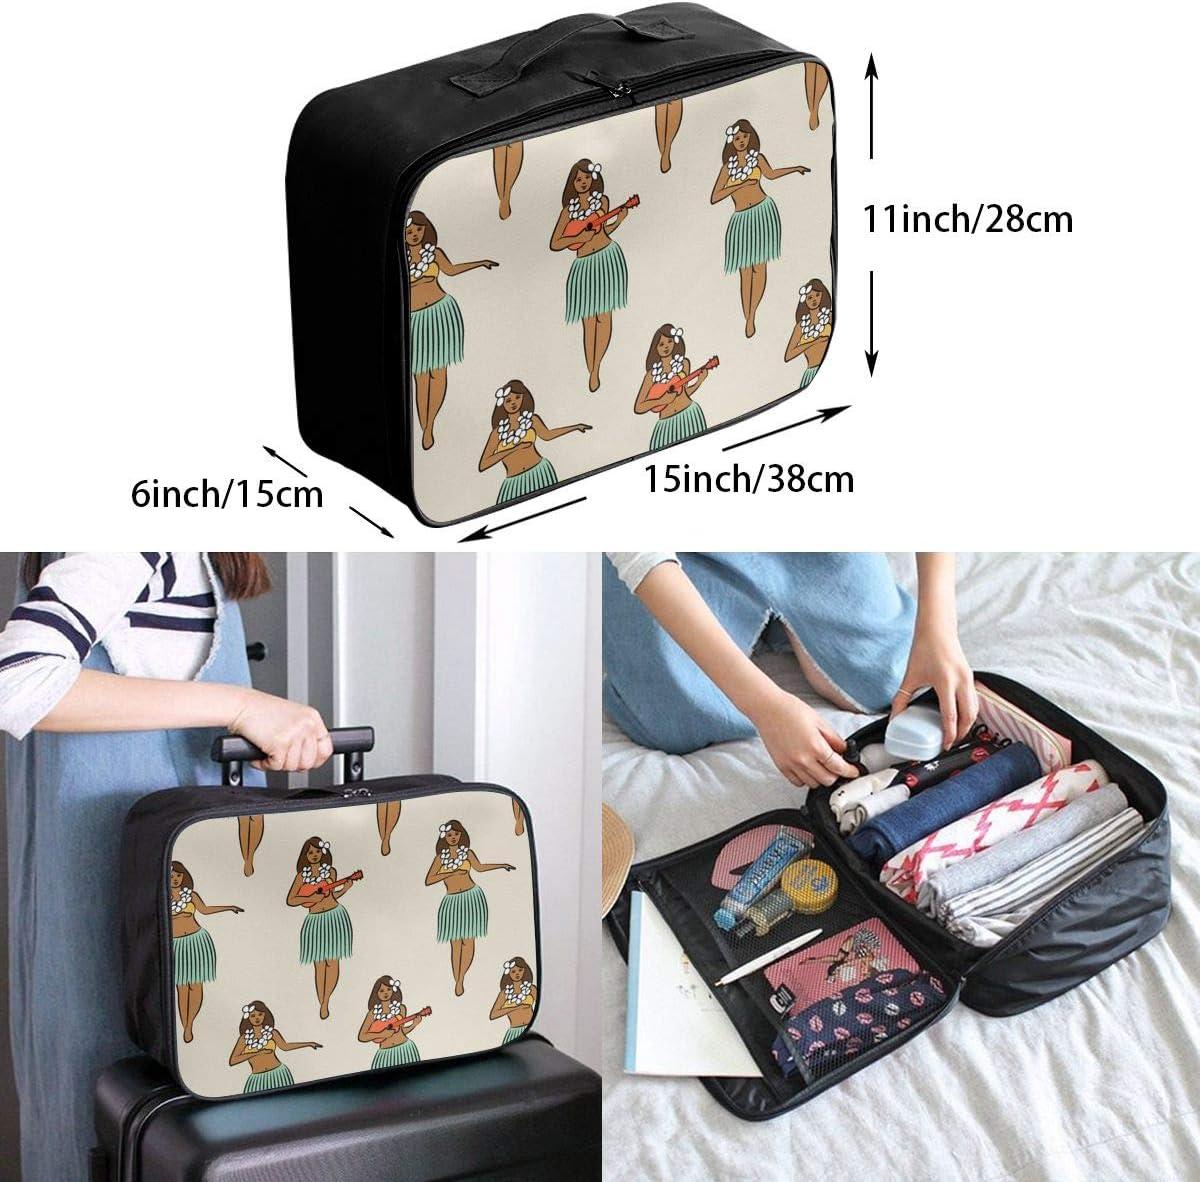 Hawaiian Hula Girl Travel Duffel Bag Waterproof Fashion Lightweight Large Capacity Portable Luggage Bag